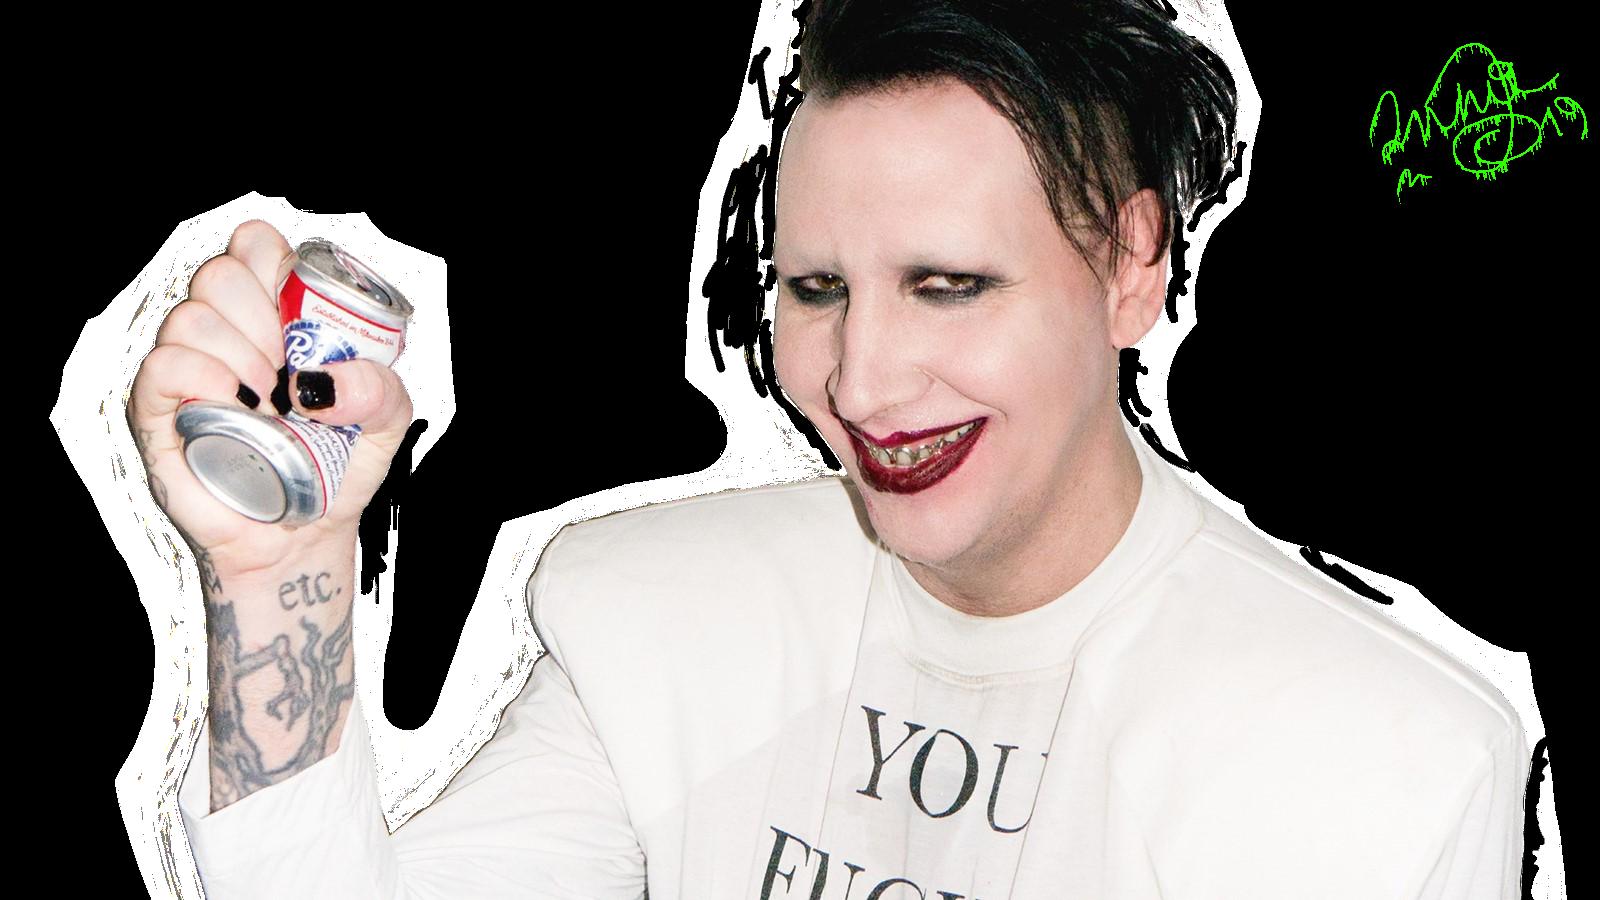 11 08 2019 Www Deviantart Com Alicegothic Photoshooting Fotoshooting Marilyn Manson Marilynmanson Marilyn Manson 26 Sept Marilyn Manson Manson Marilyn